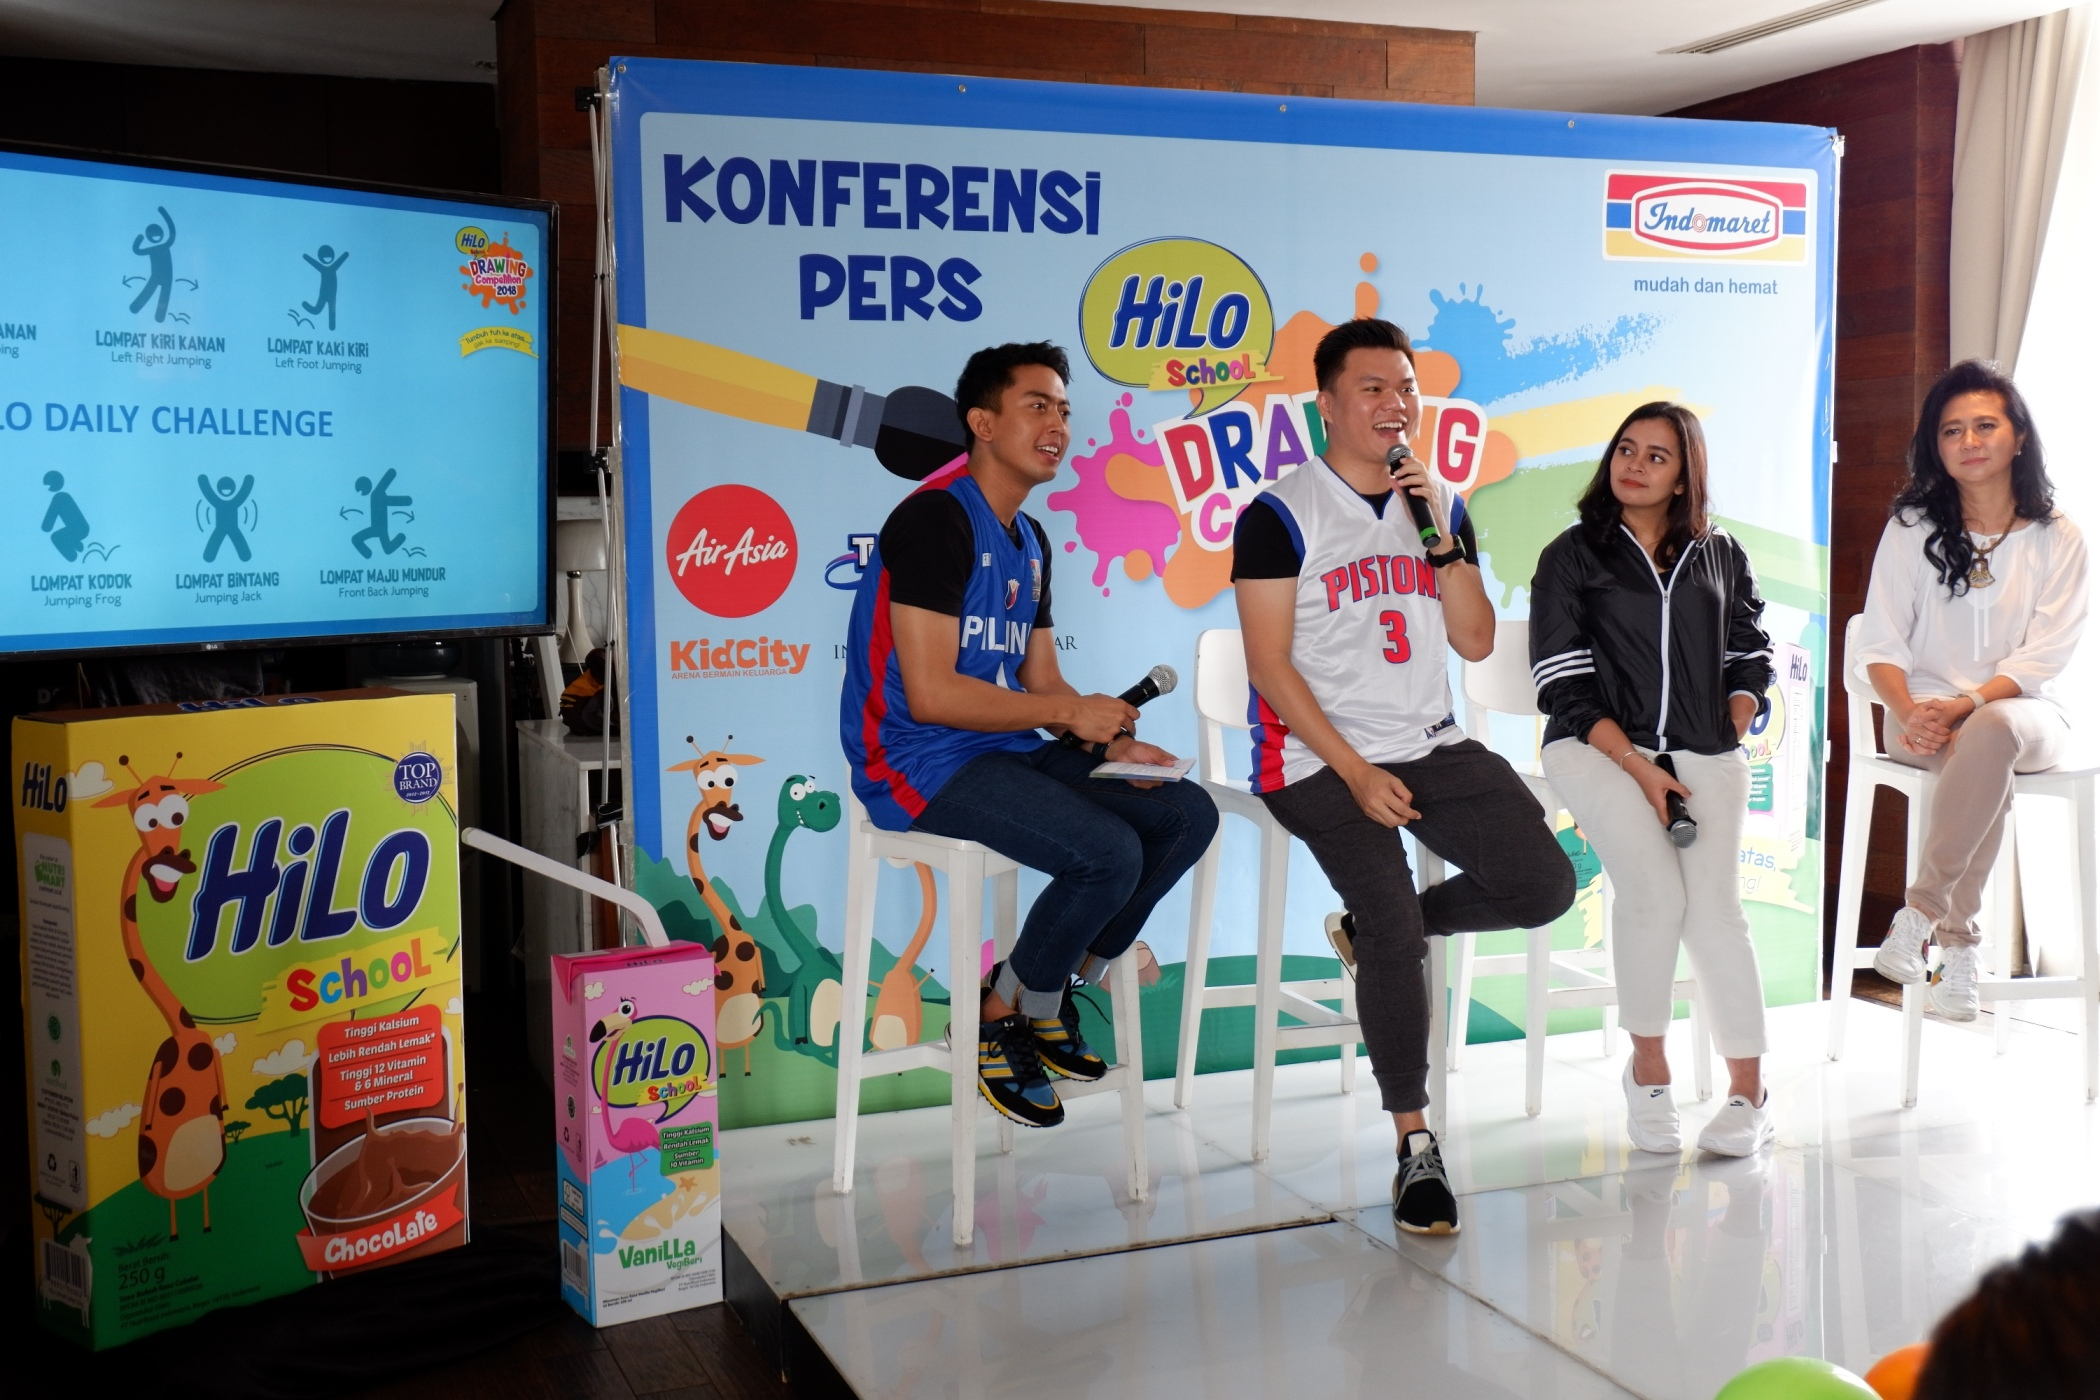 Our Blog Blog Brand Updates External Event HiLo School Drawing petition Hadir Lagi Tahun Ini